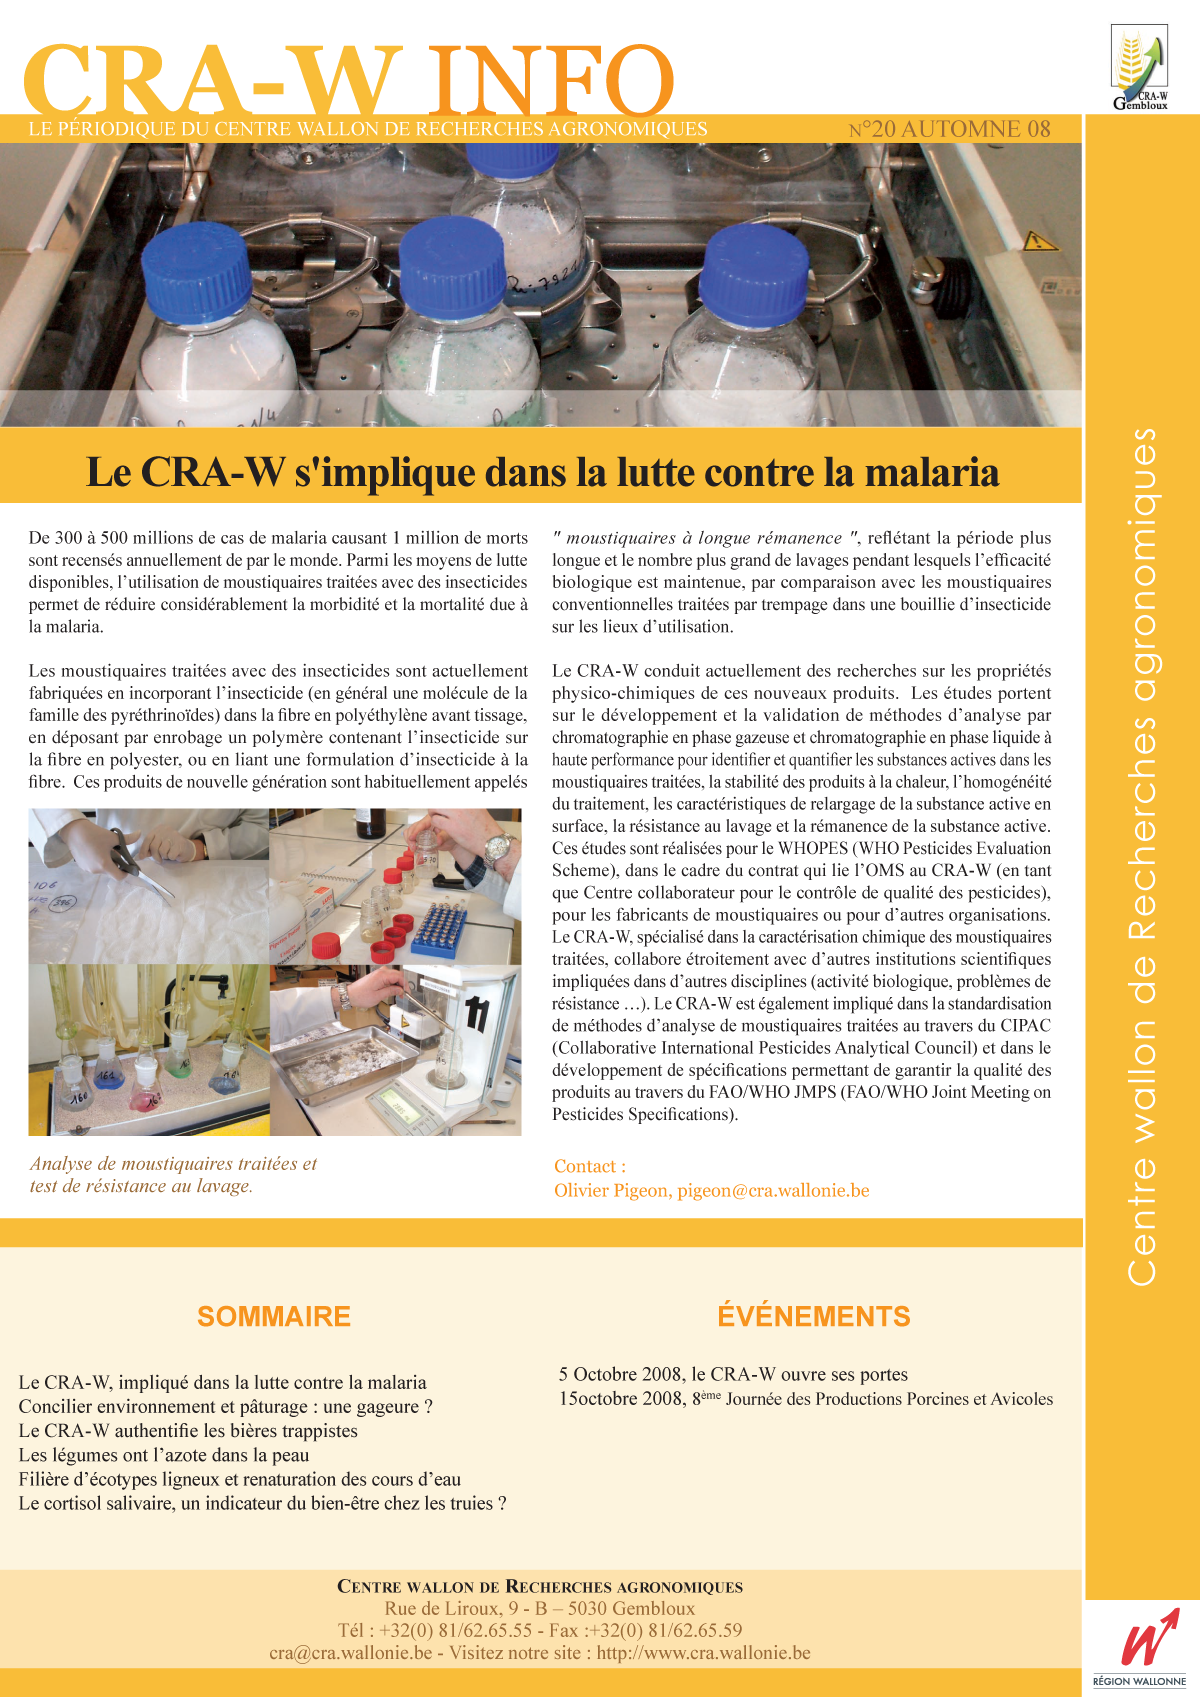 CRAW info n° 20